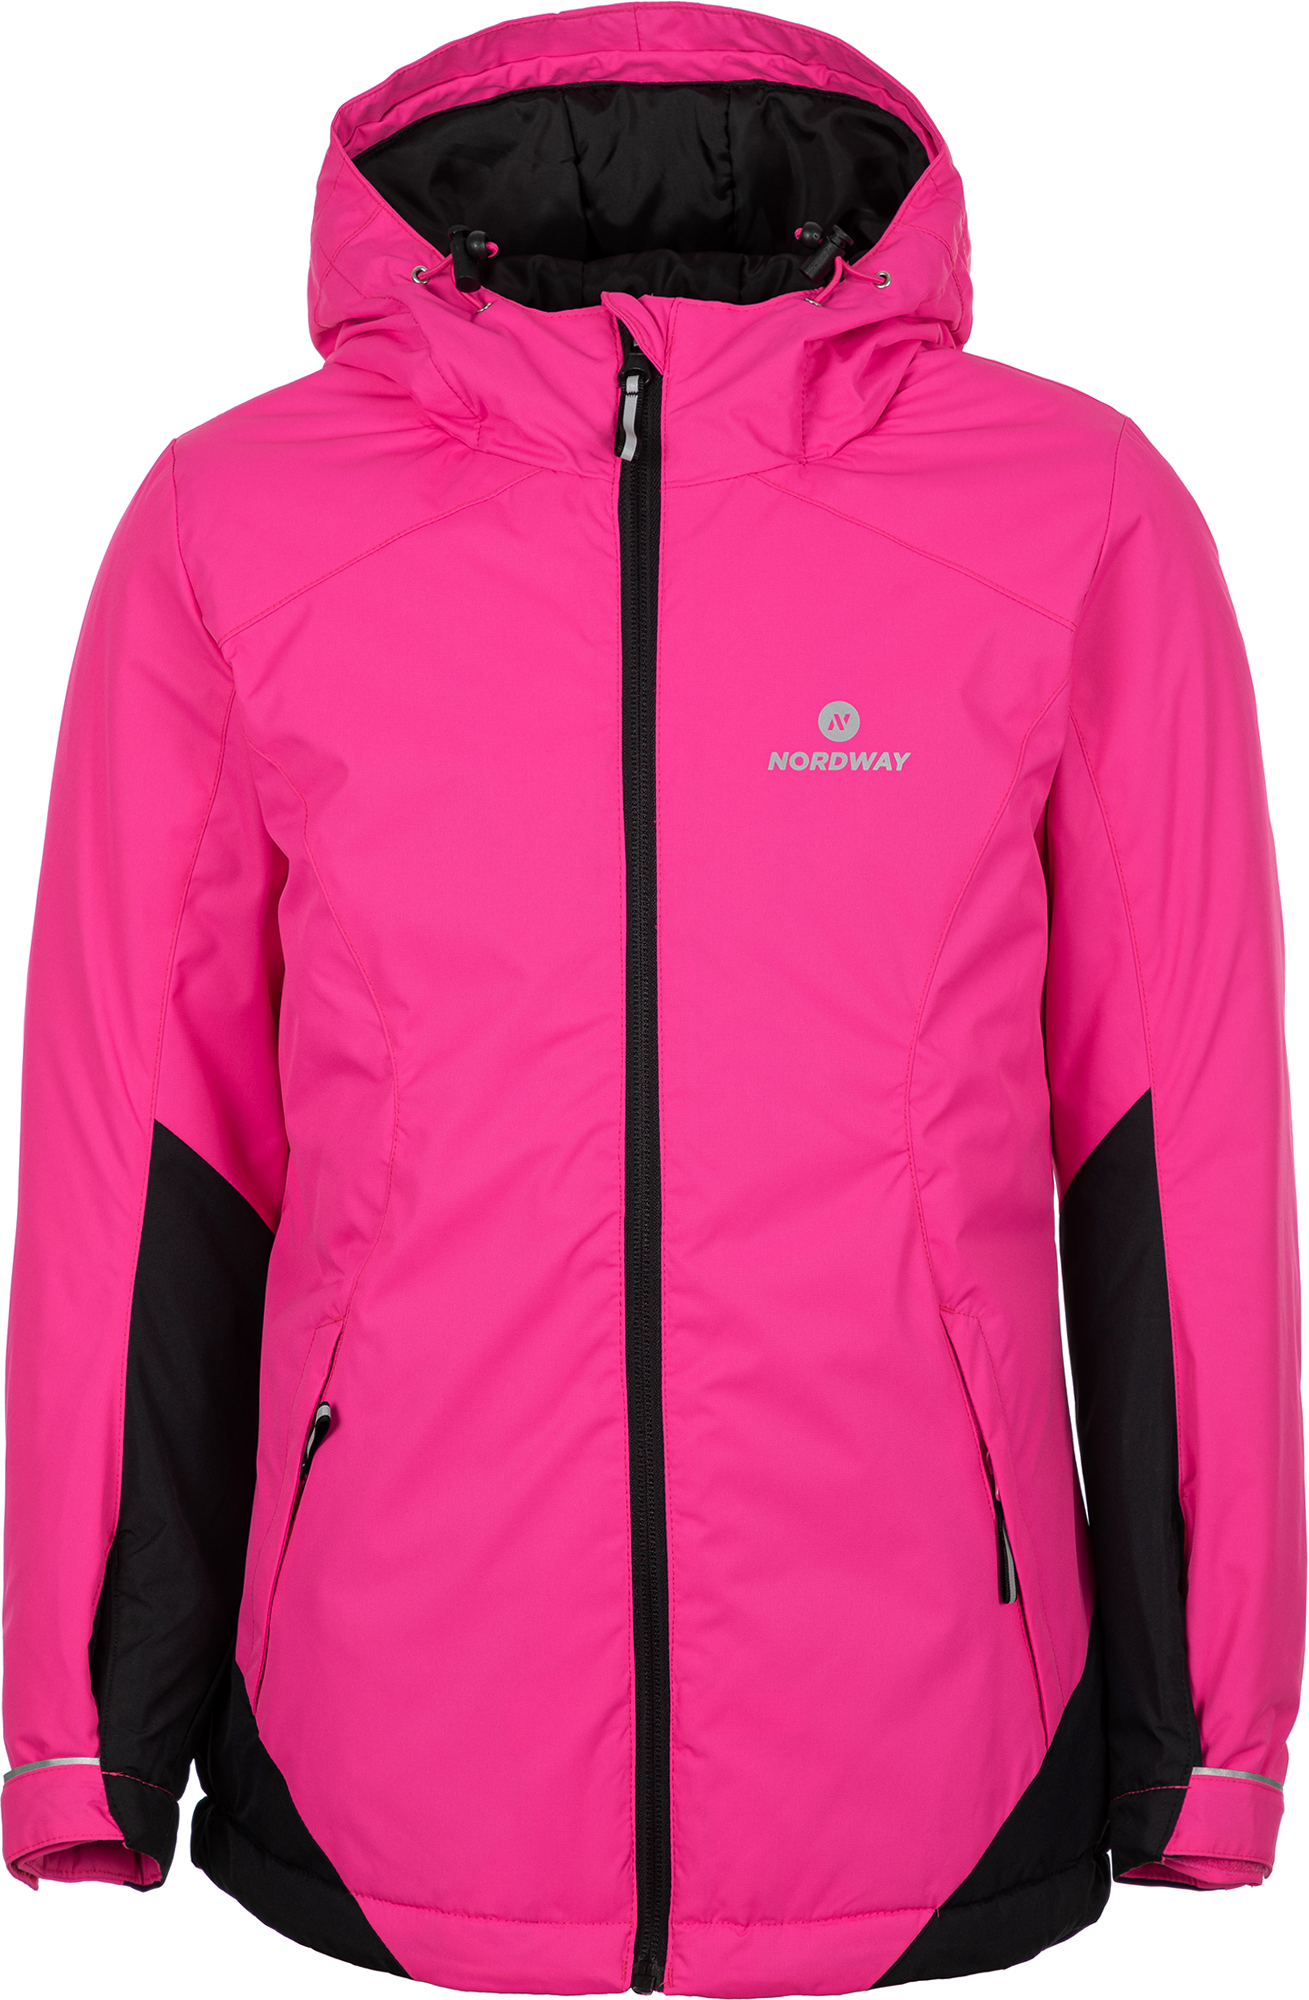 Nordway Куртка для девочек Nordway, размер 164